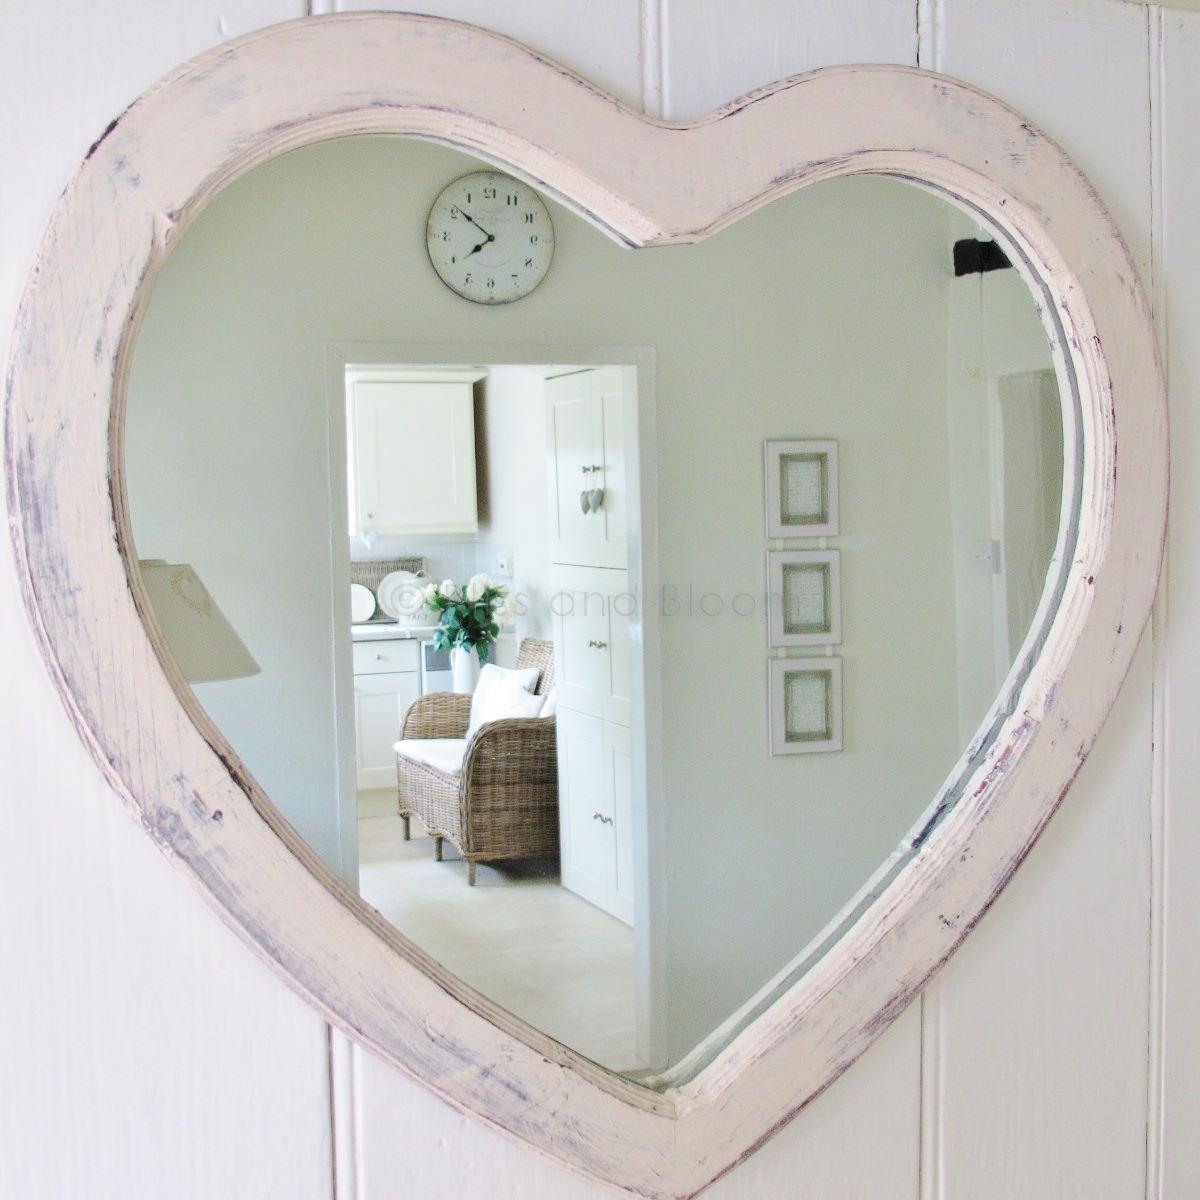 Preferred Large cream heart wall mirror | Bliss and Bloom Ltd KU43